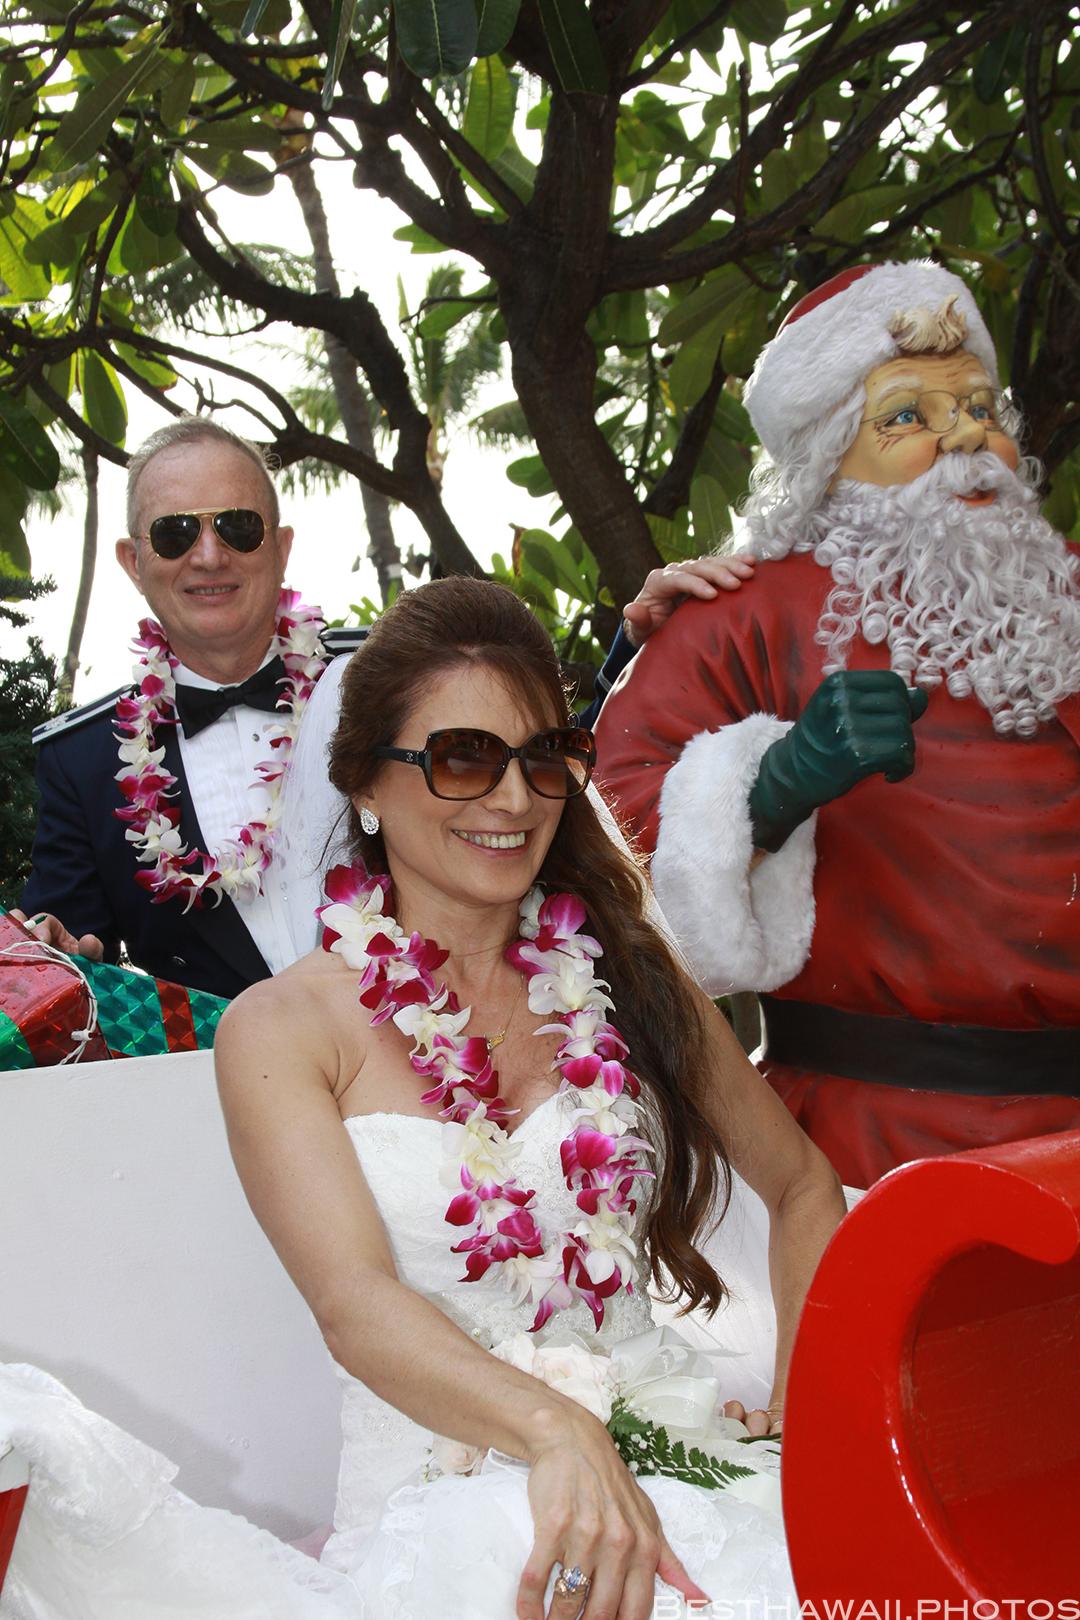 Wedding Photos at Hilton Hawaiian Village by Pasha www.BestHawaii.photos 121820158644